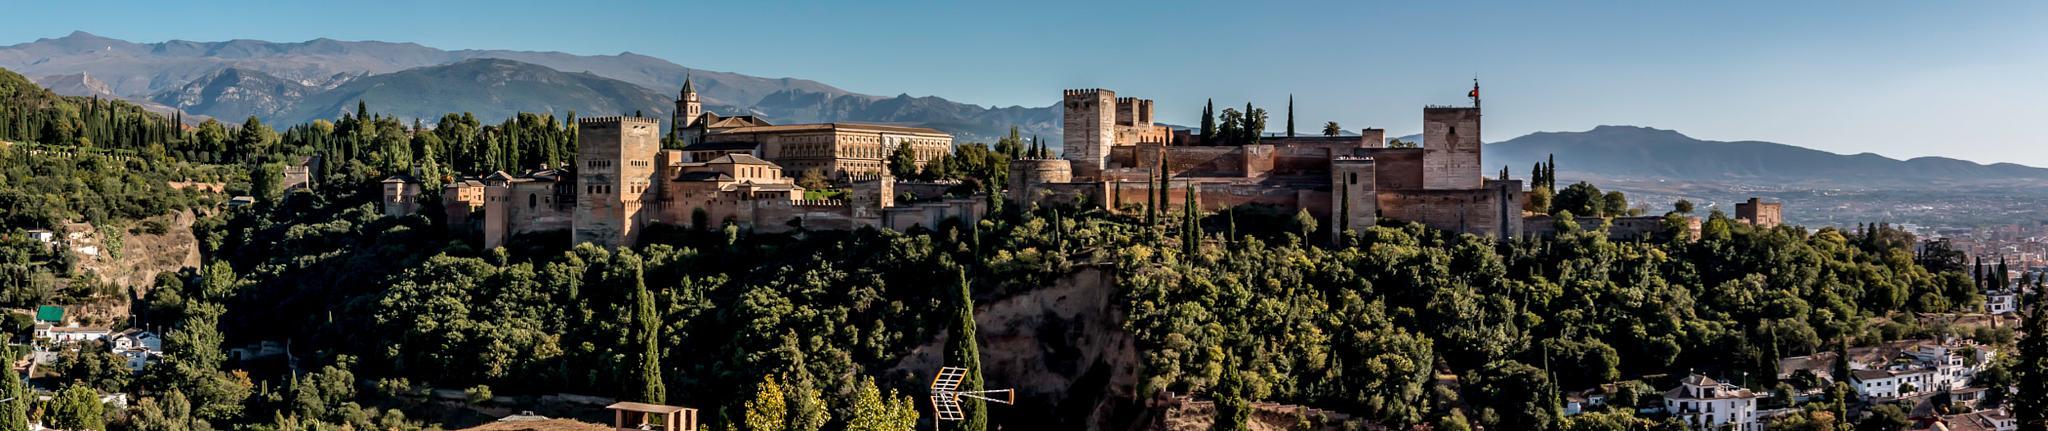 The Alhambra by stephenhops